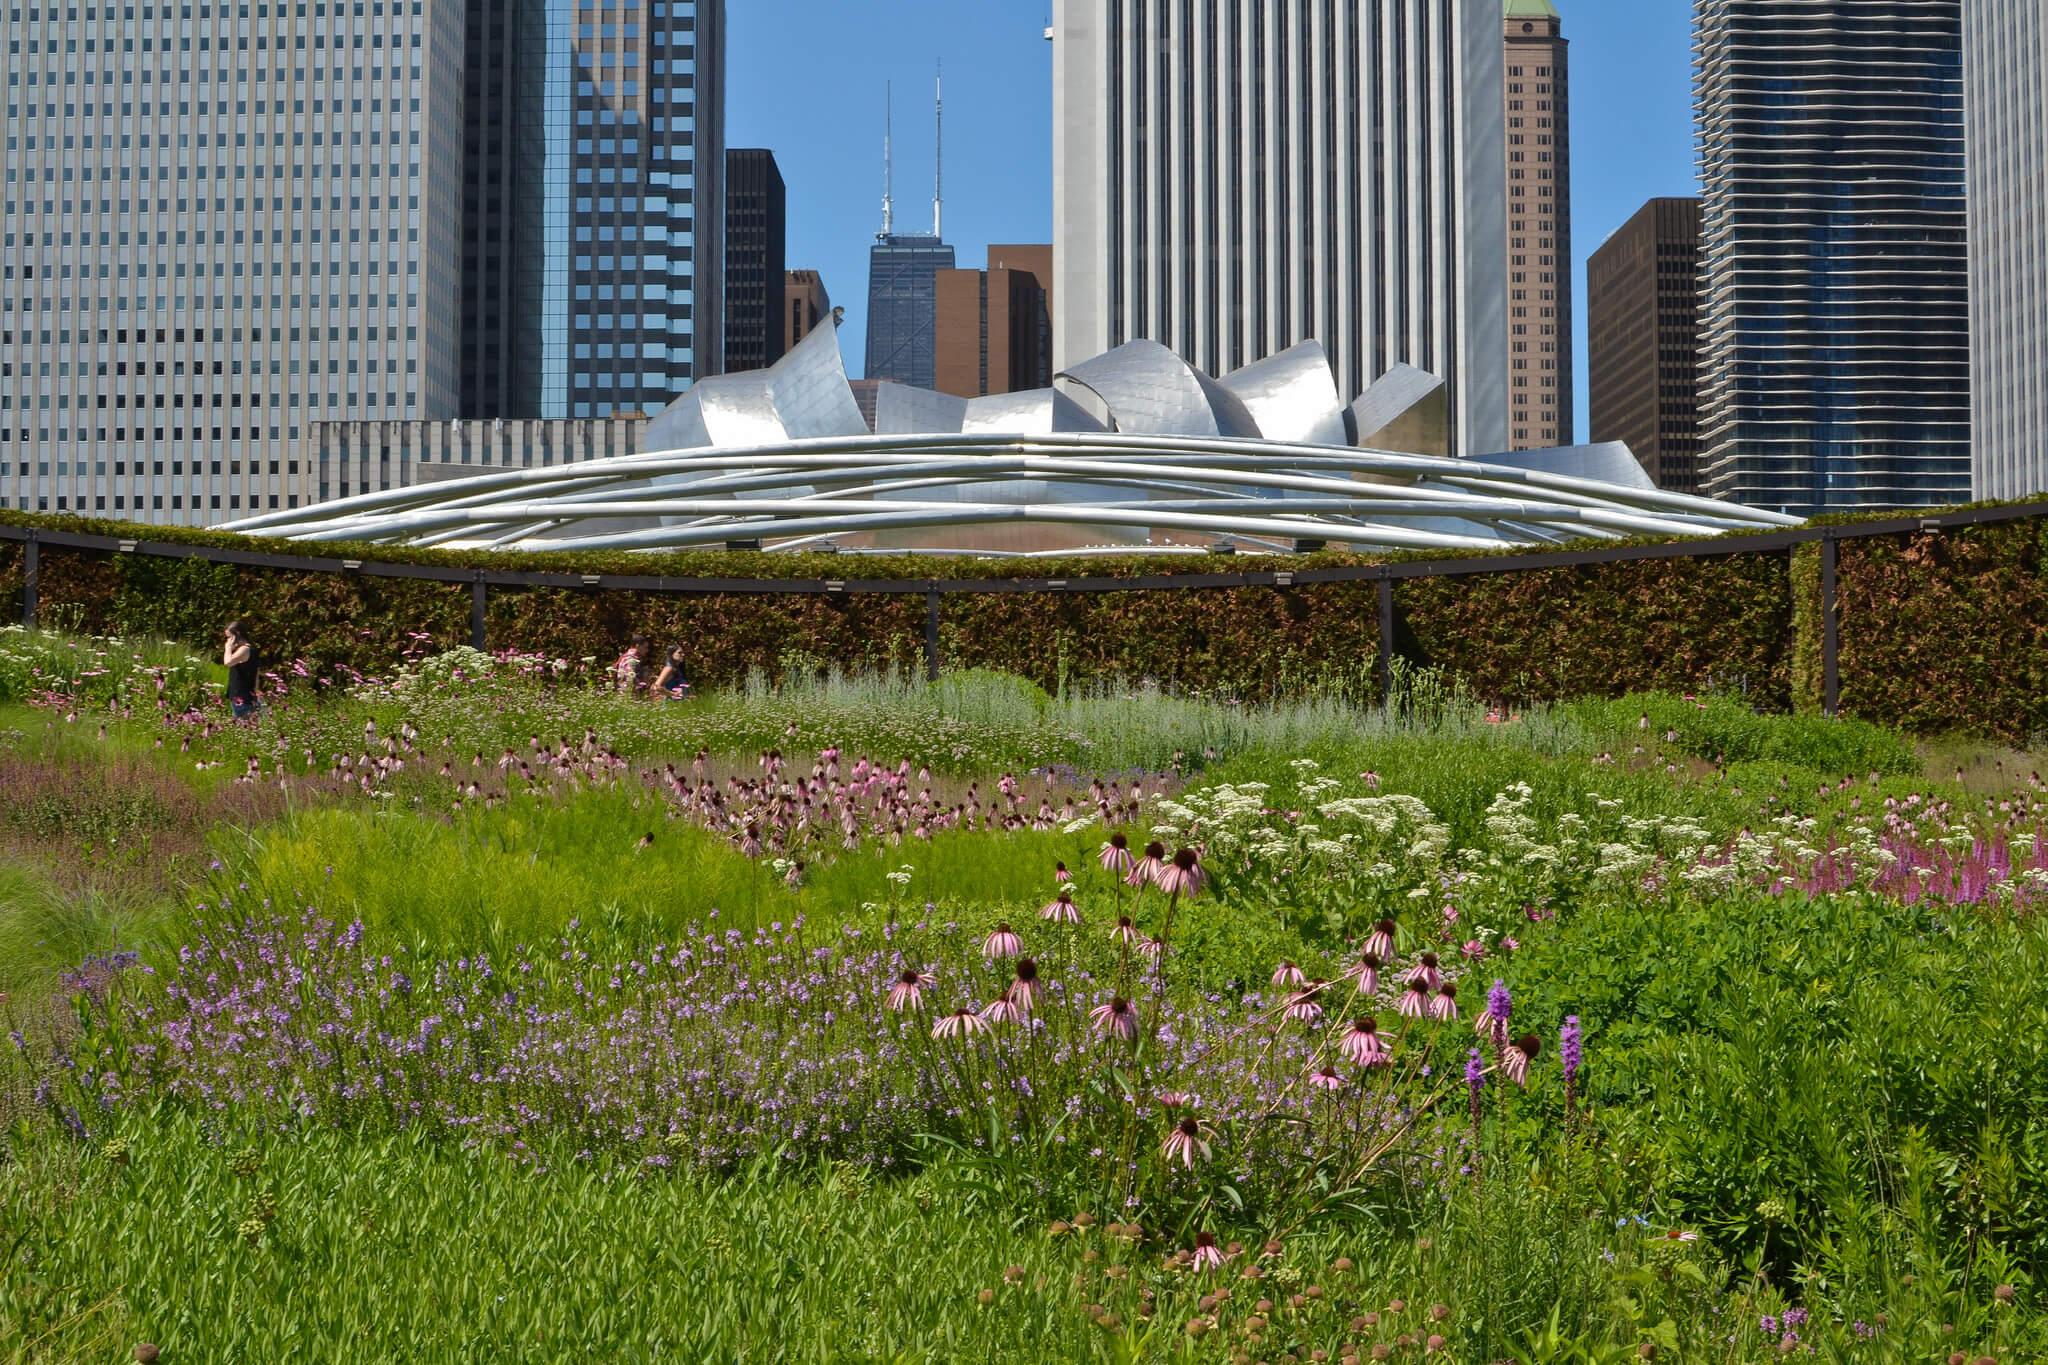 Center for Neighborhood Technology - Lurie Garden at Millennium Park – Chicago